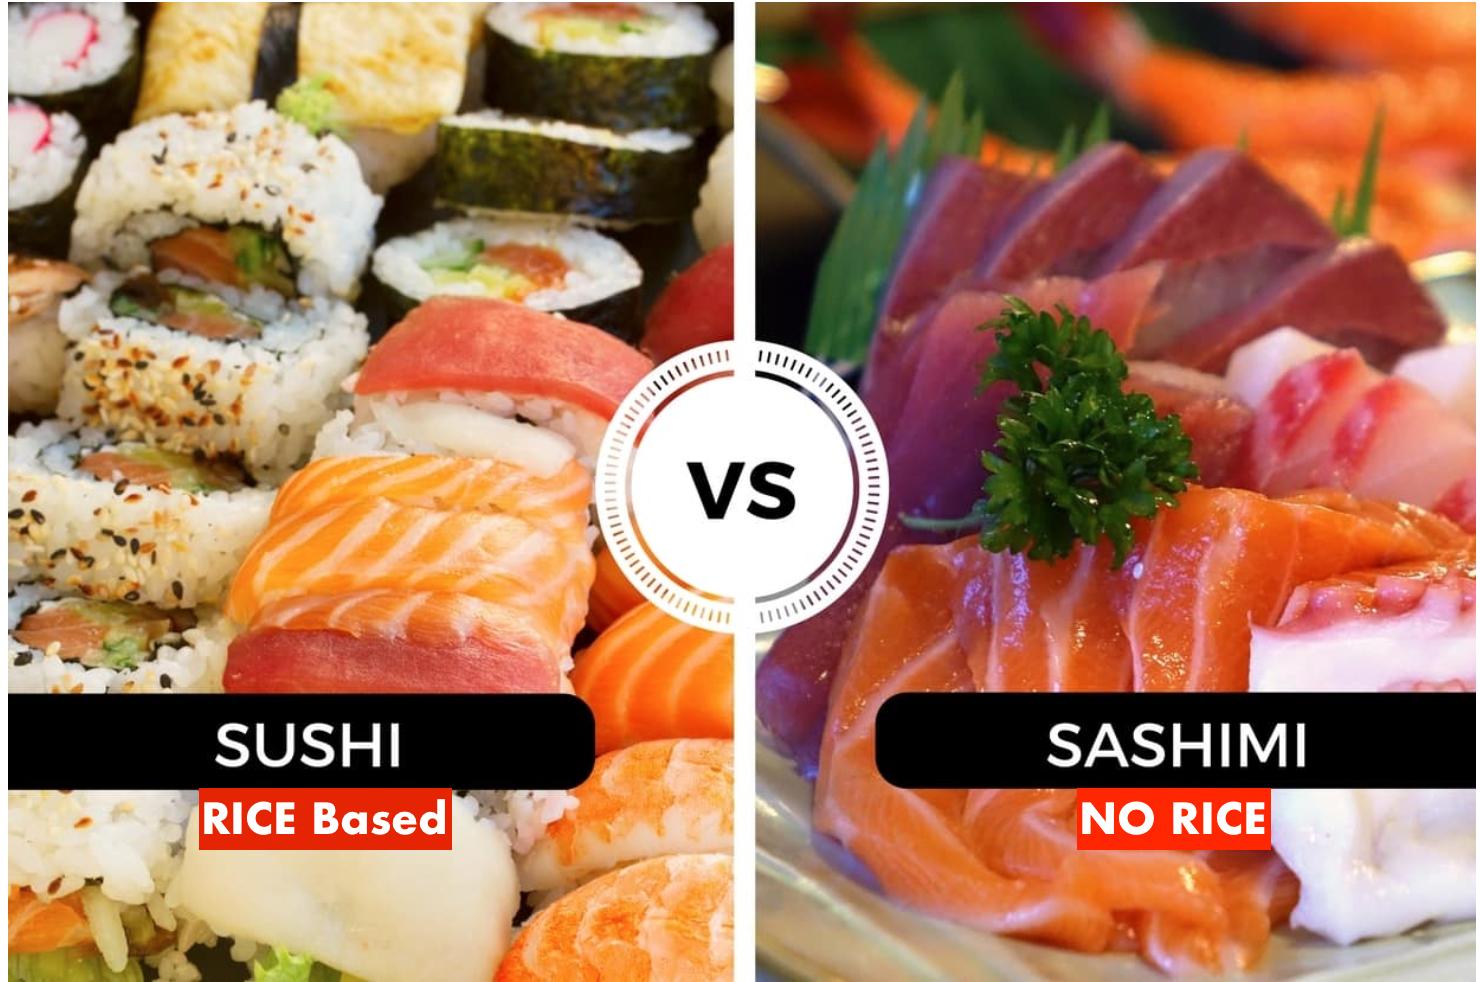 Sushi or Sashimi